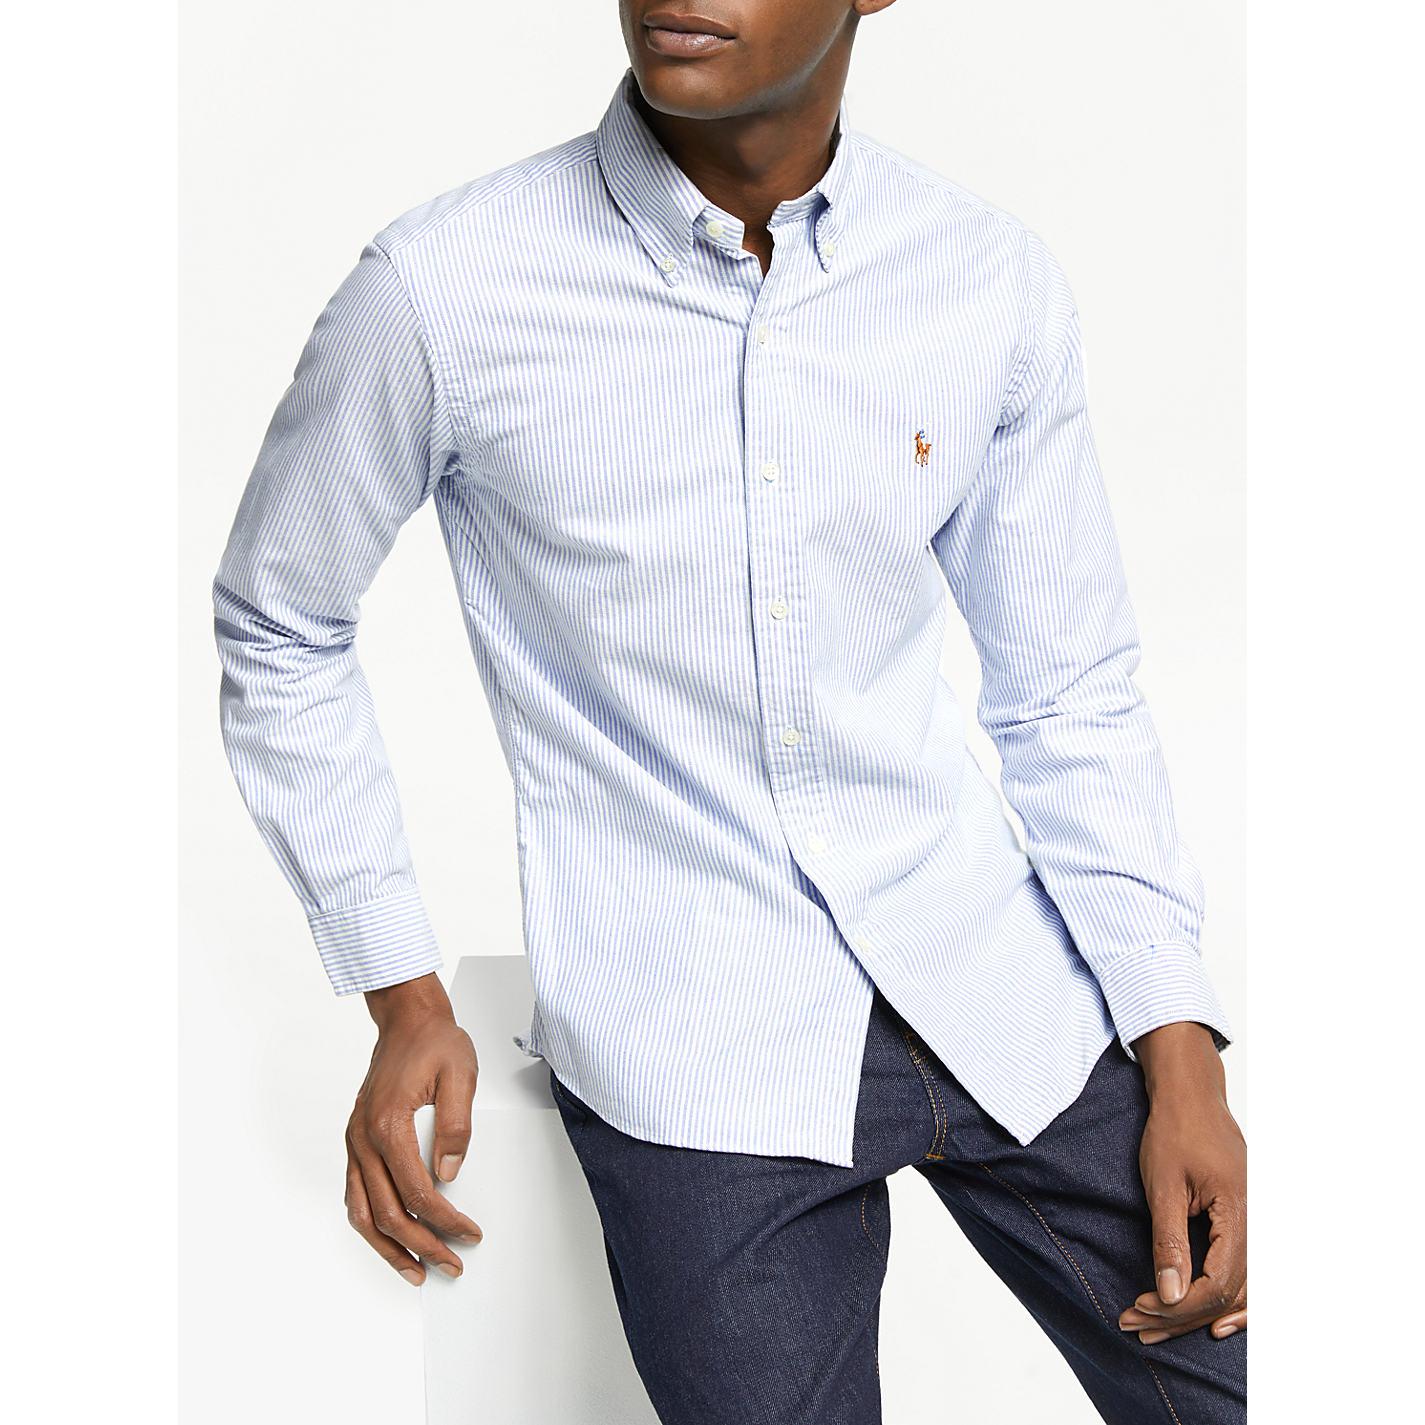 Buy Polo Ralph Lauren Slim Fit Striped Oxford Shirt Blue White  # Muebles Ralph Lauren Espana